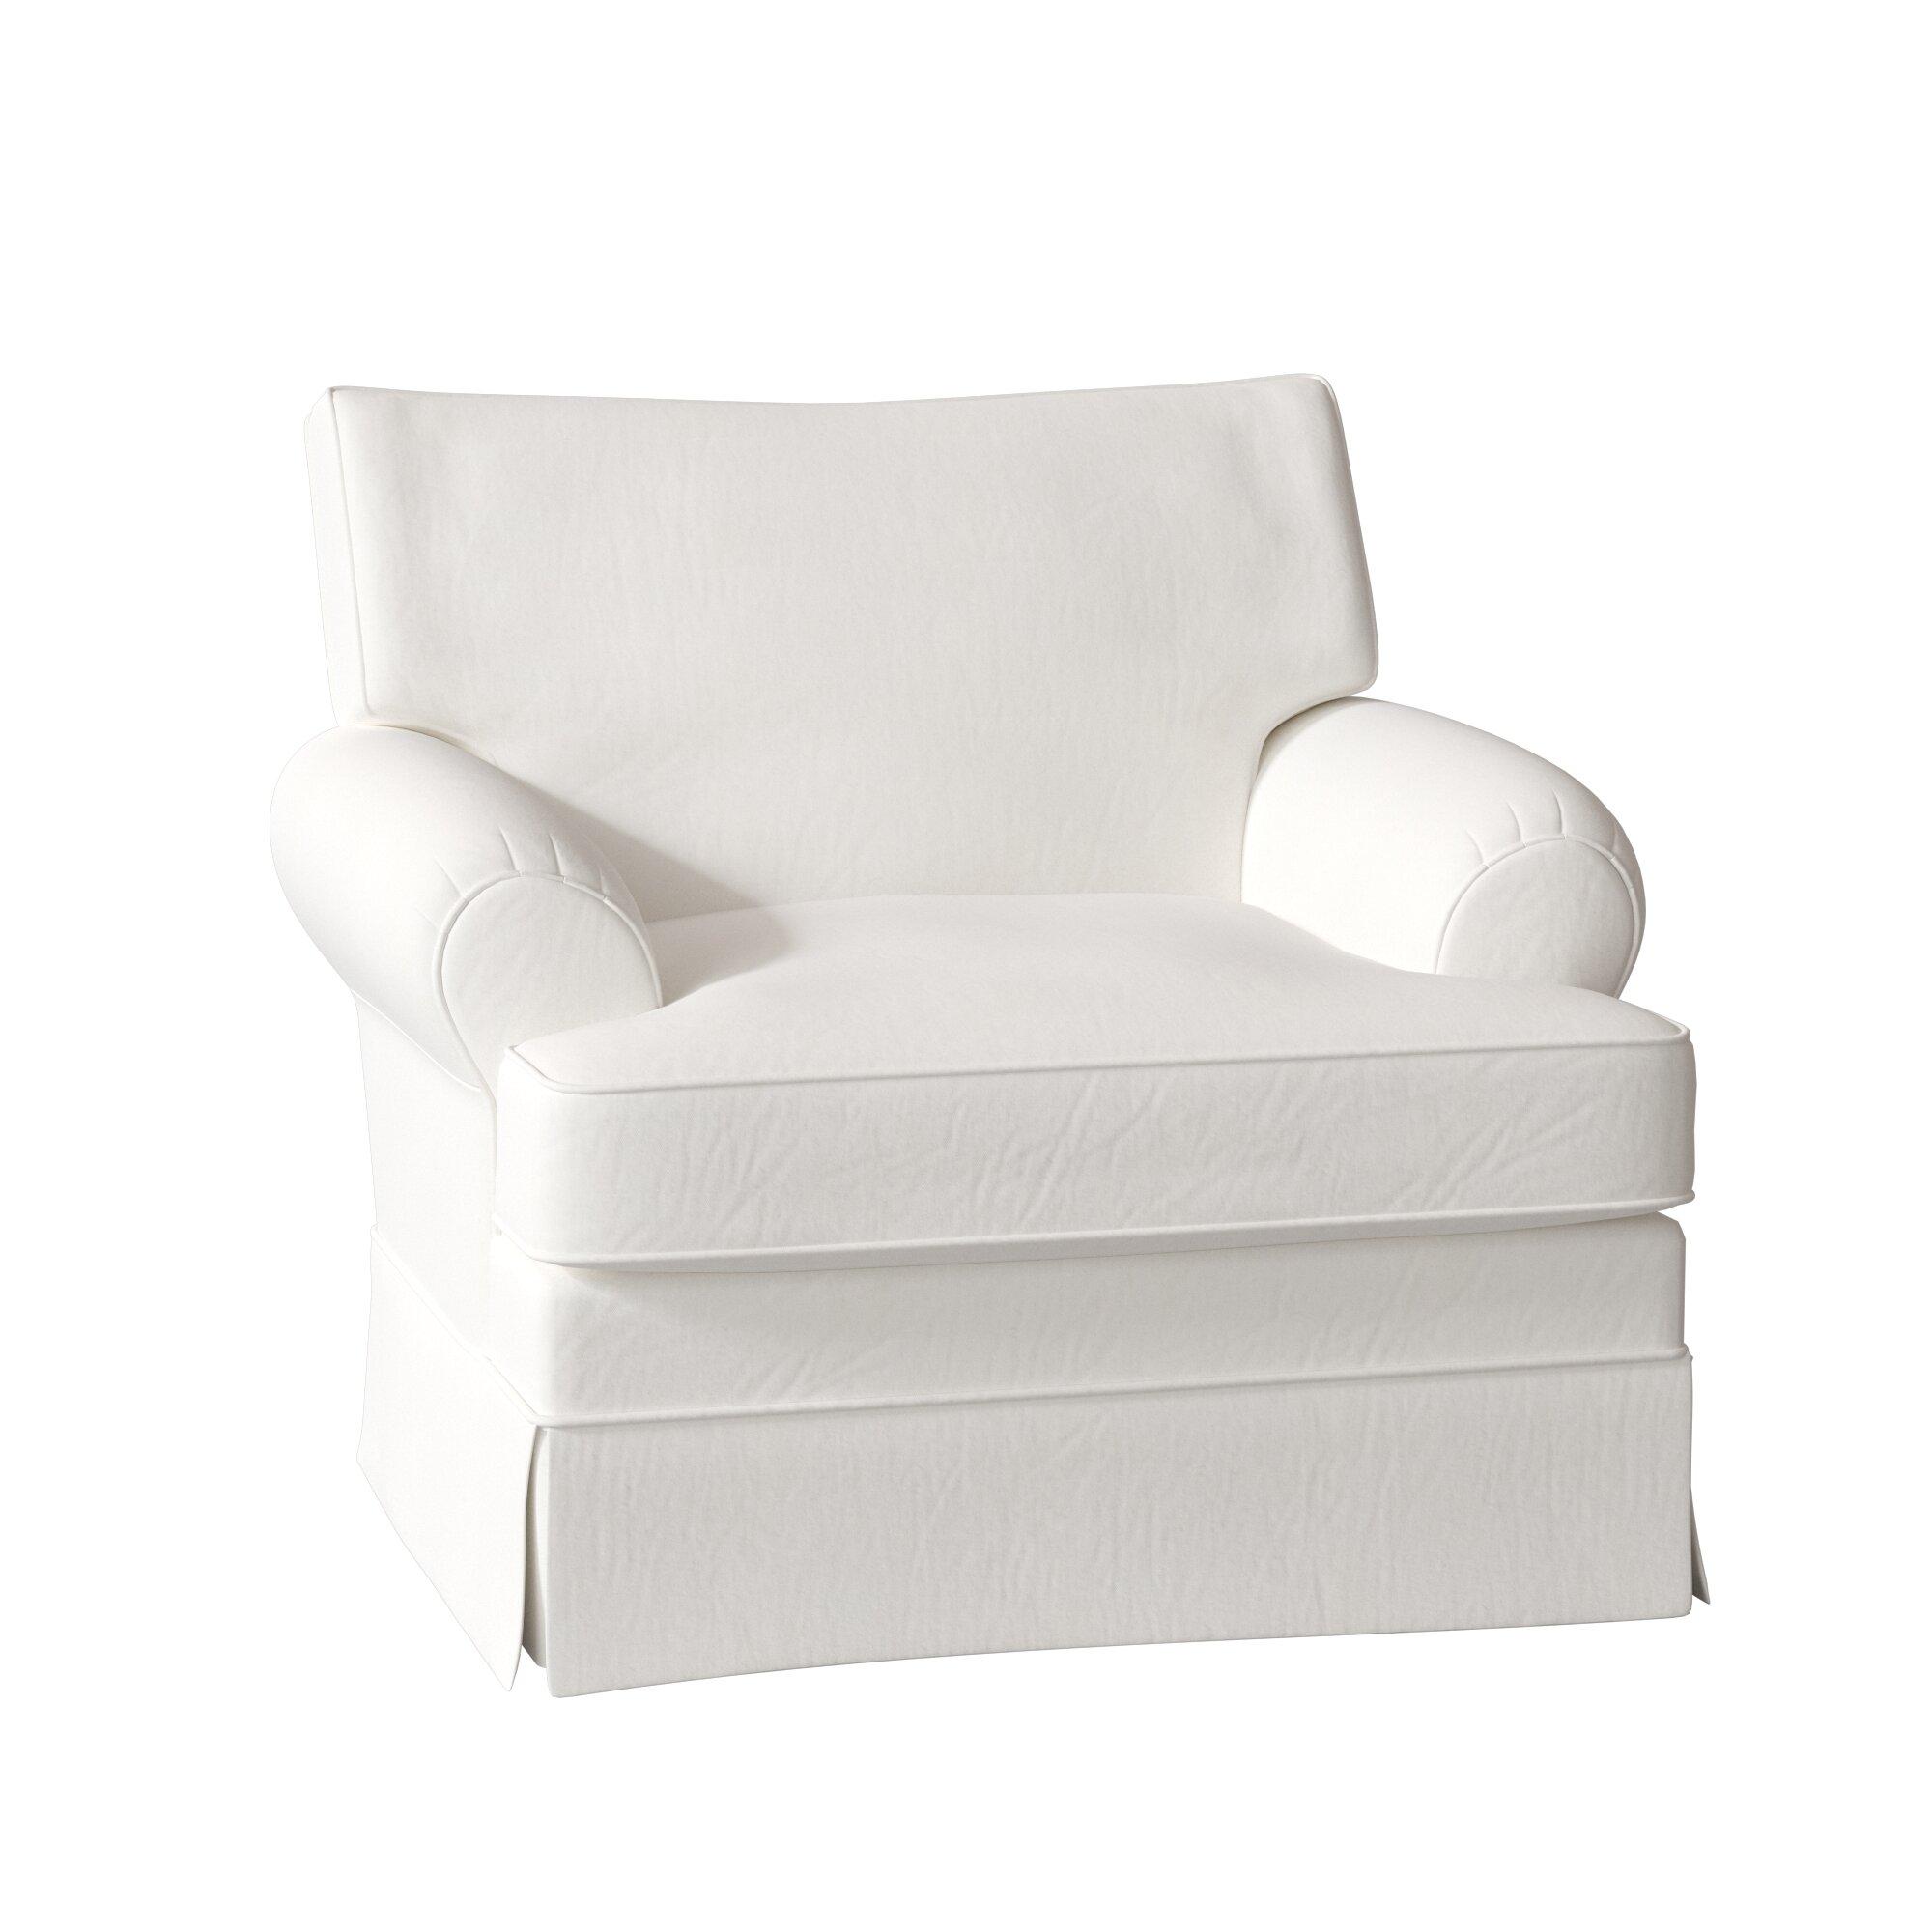 Incredible Wayfair Custom Upholstery Lily Swivel Chair Reviews Wayfair Alphanode Cool Chair Designs And Ideas Alphanodeonline